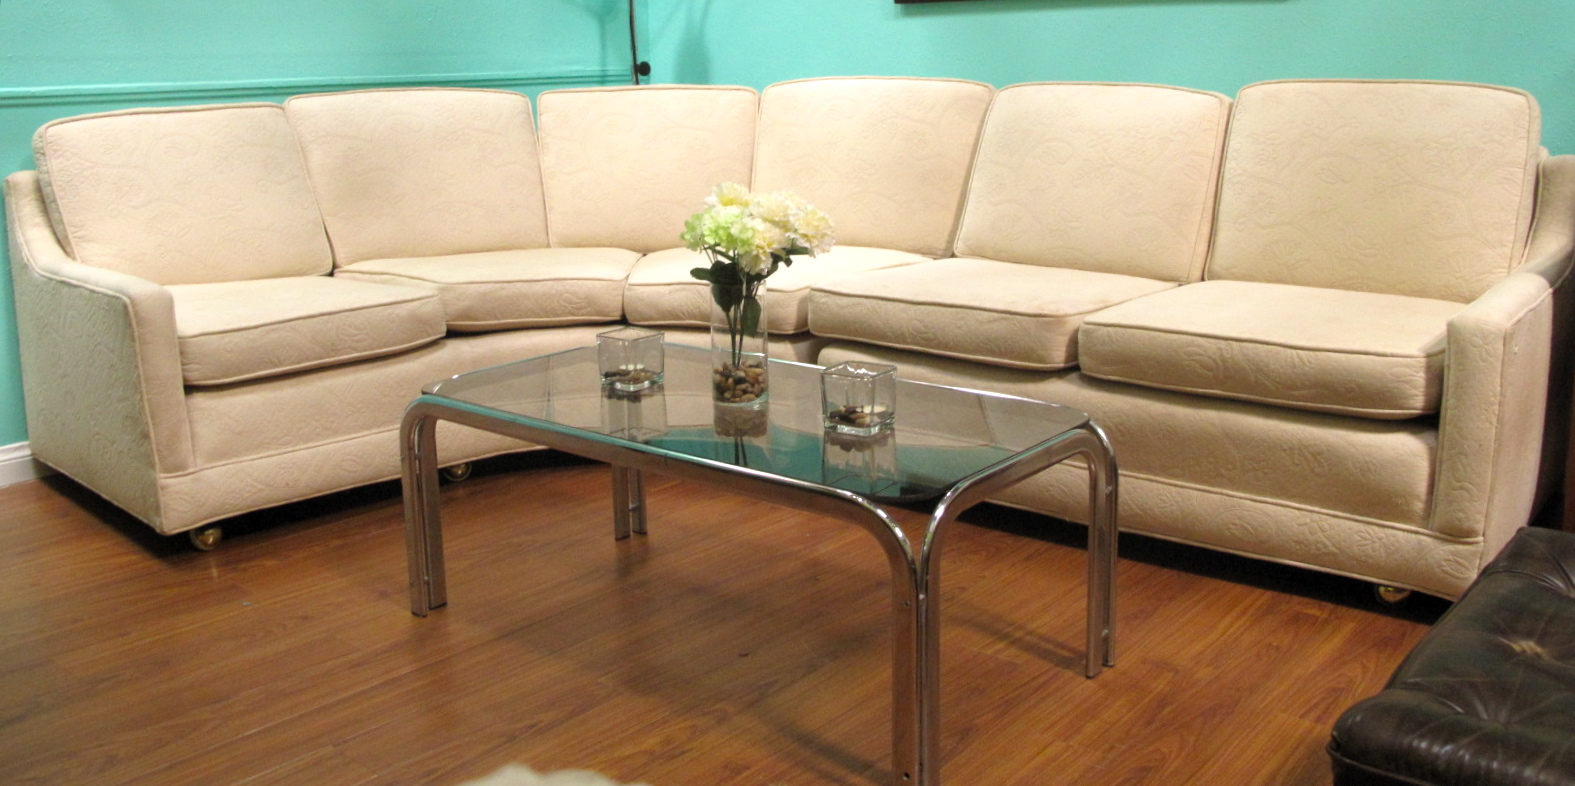 9 Piece Sectional Sofa